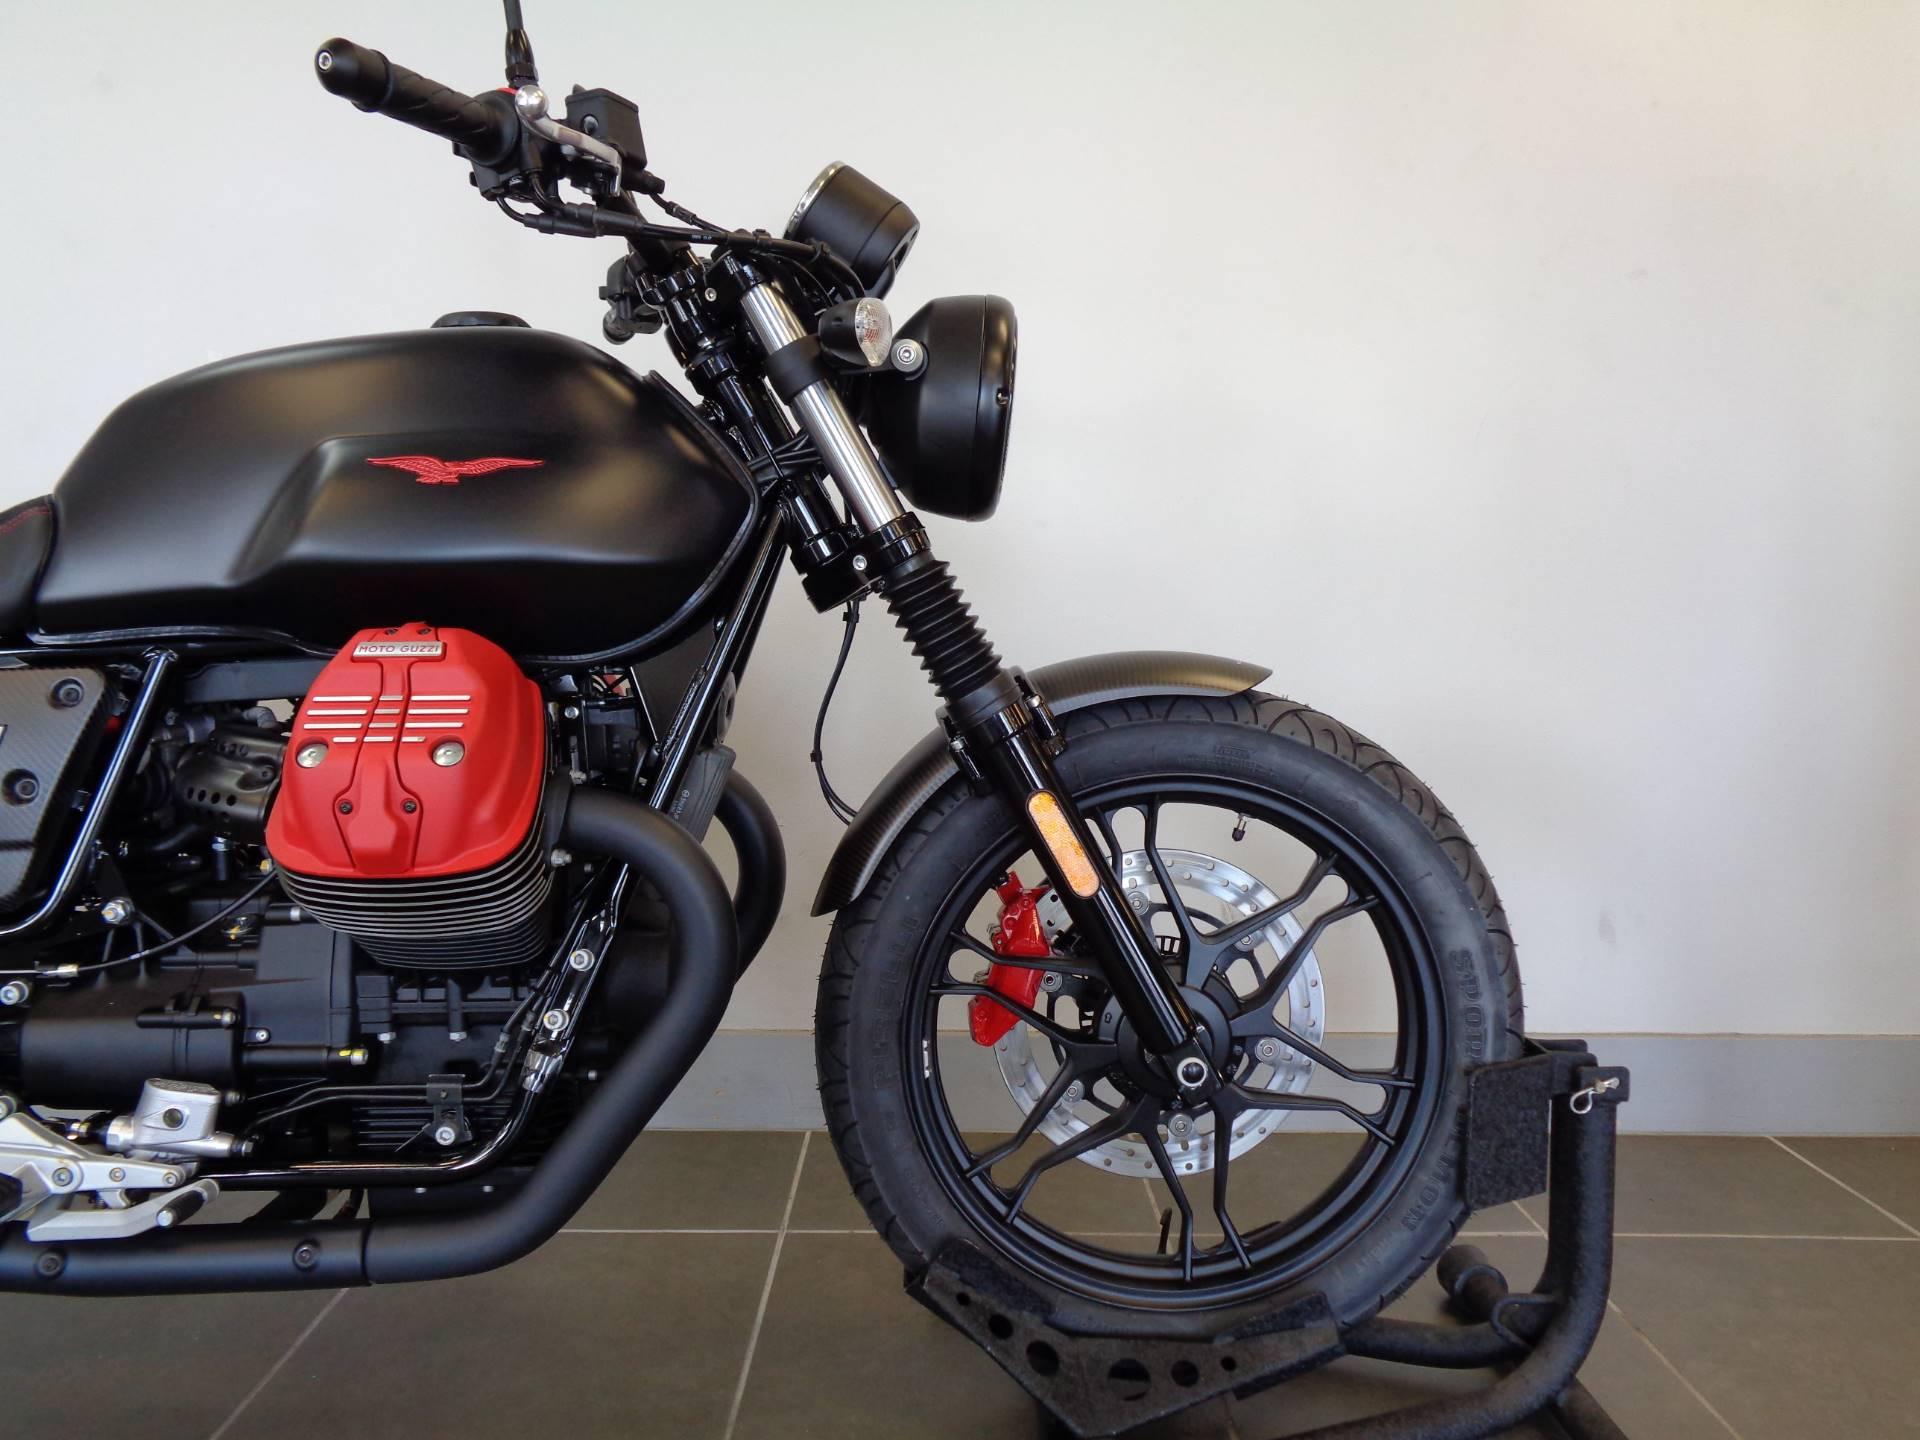 2018 Moto Guzzi V7 III Carbon Dark 2